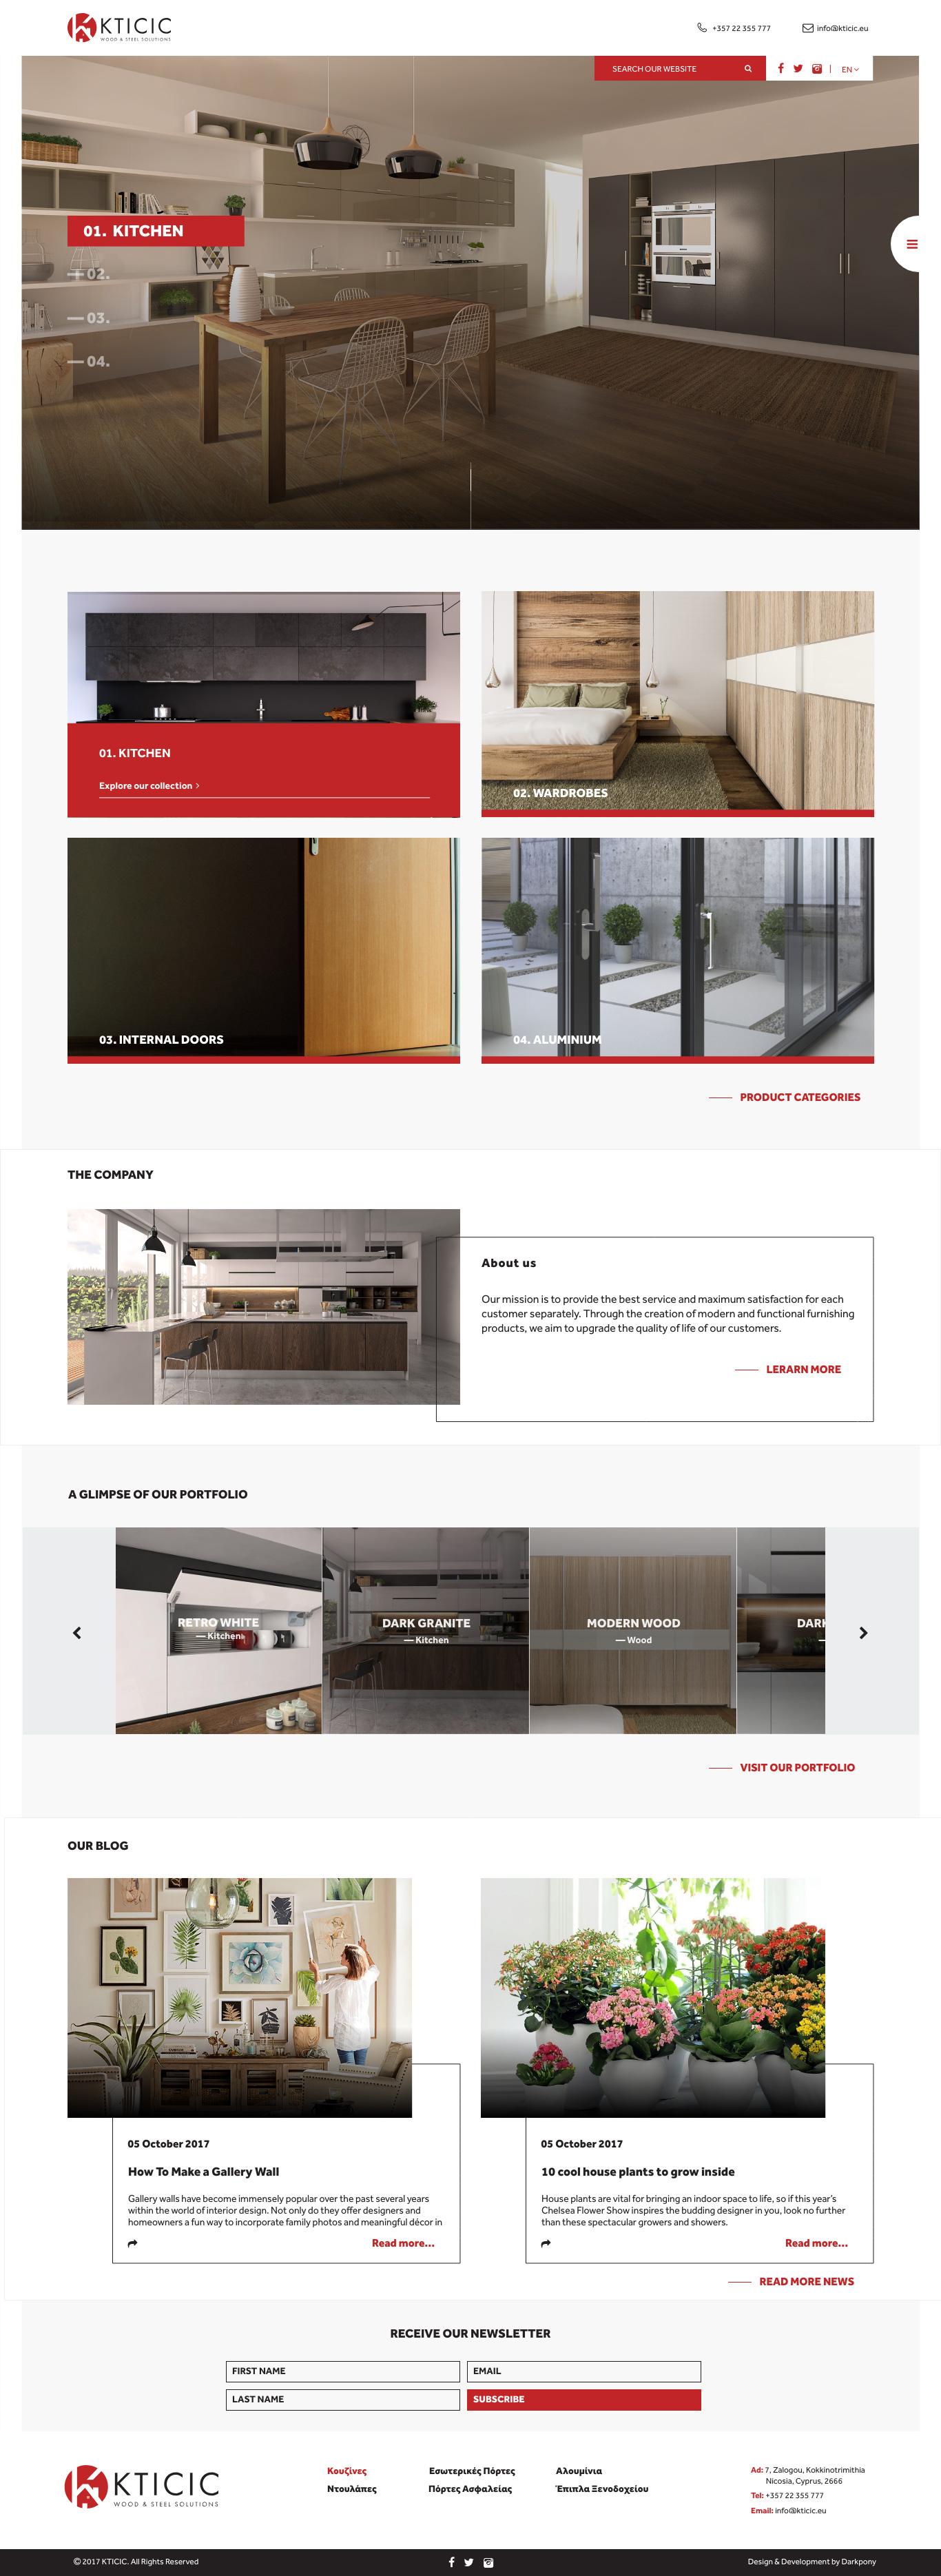 kticic-home-website-cyprus-darkpony